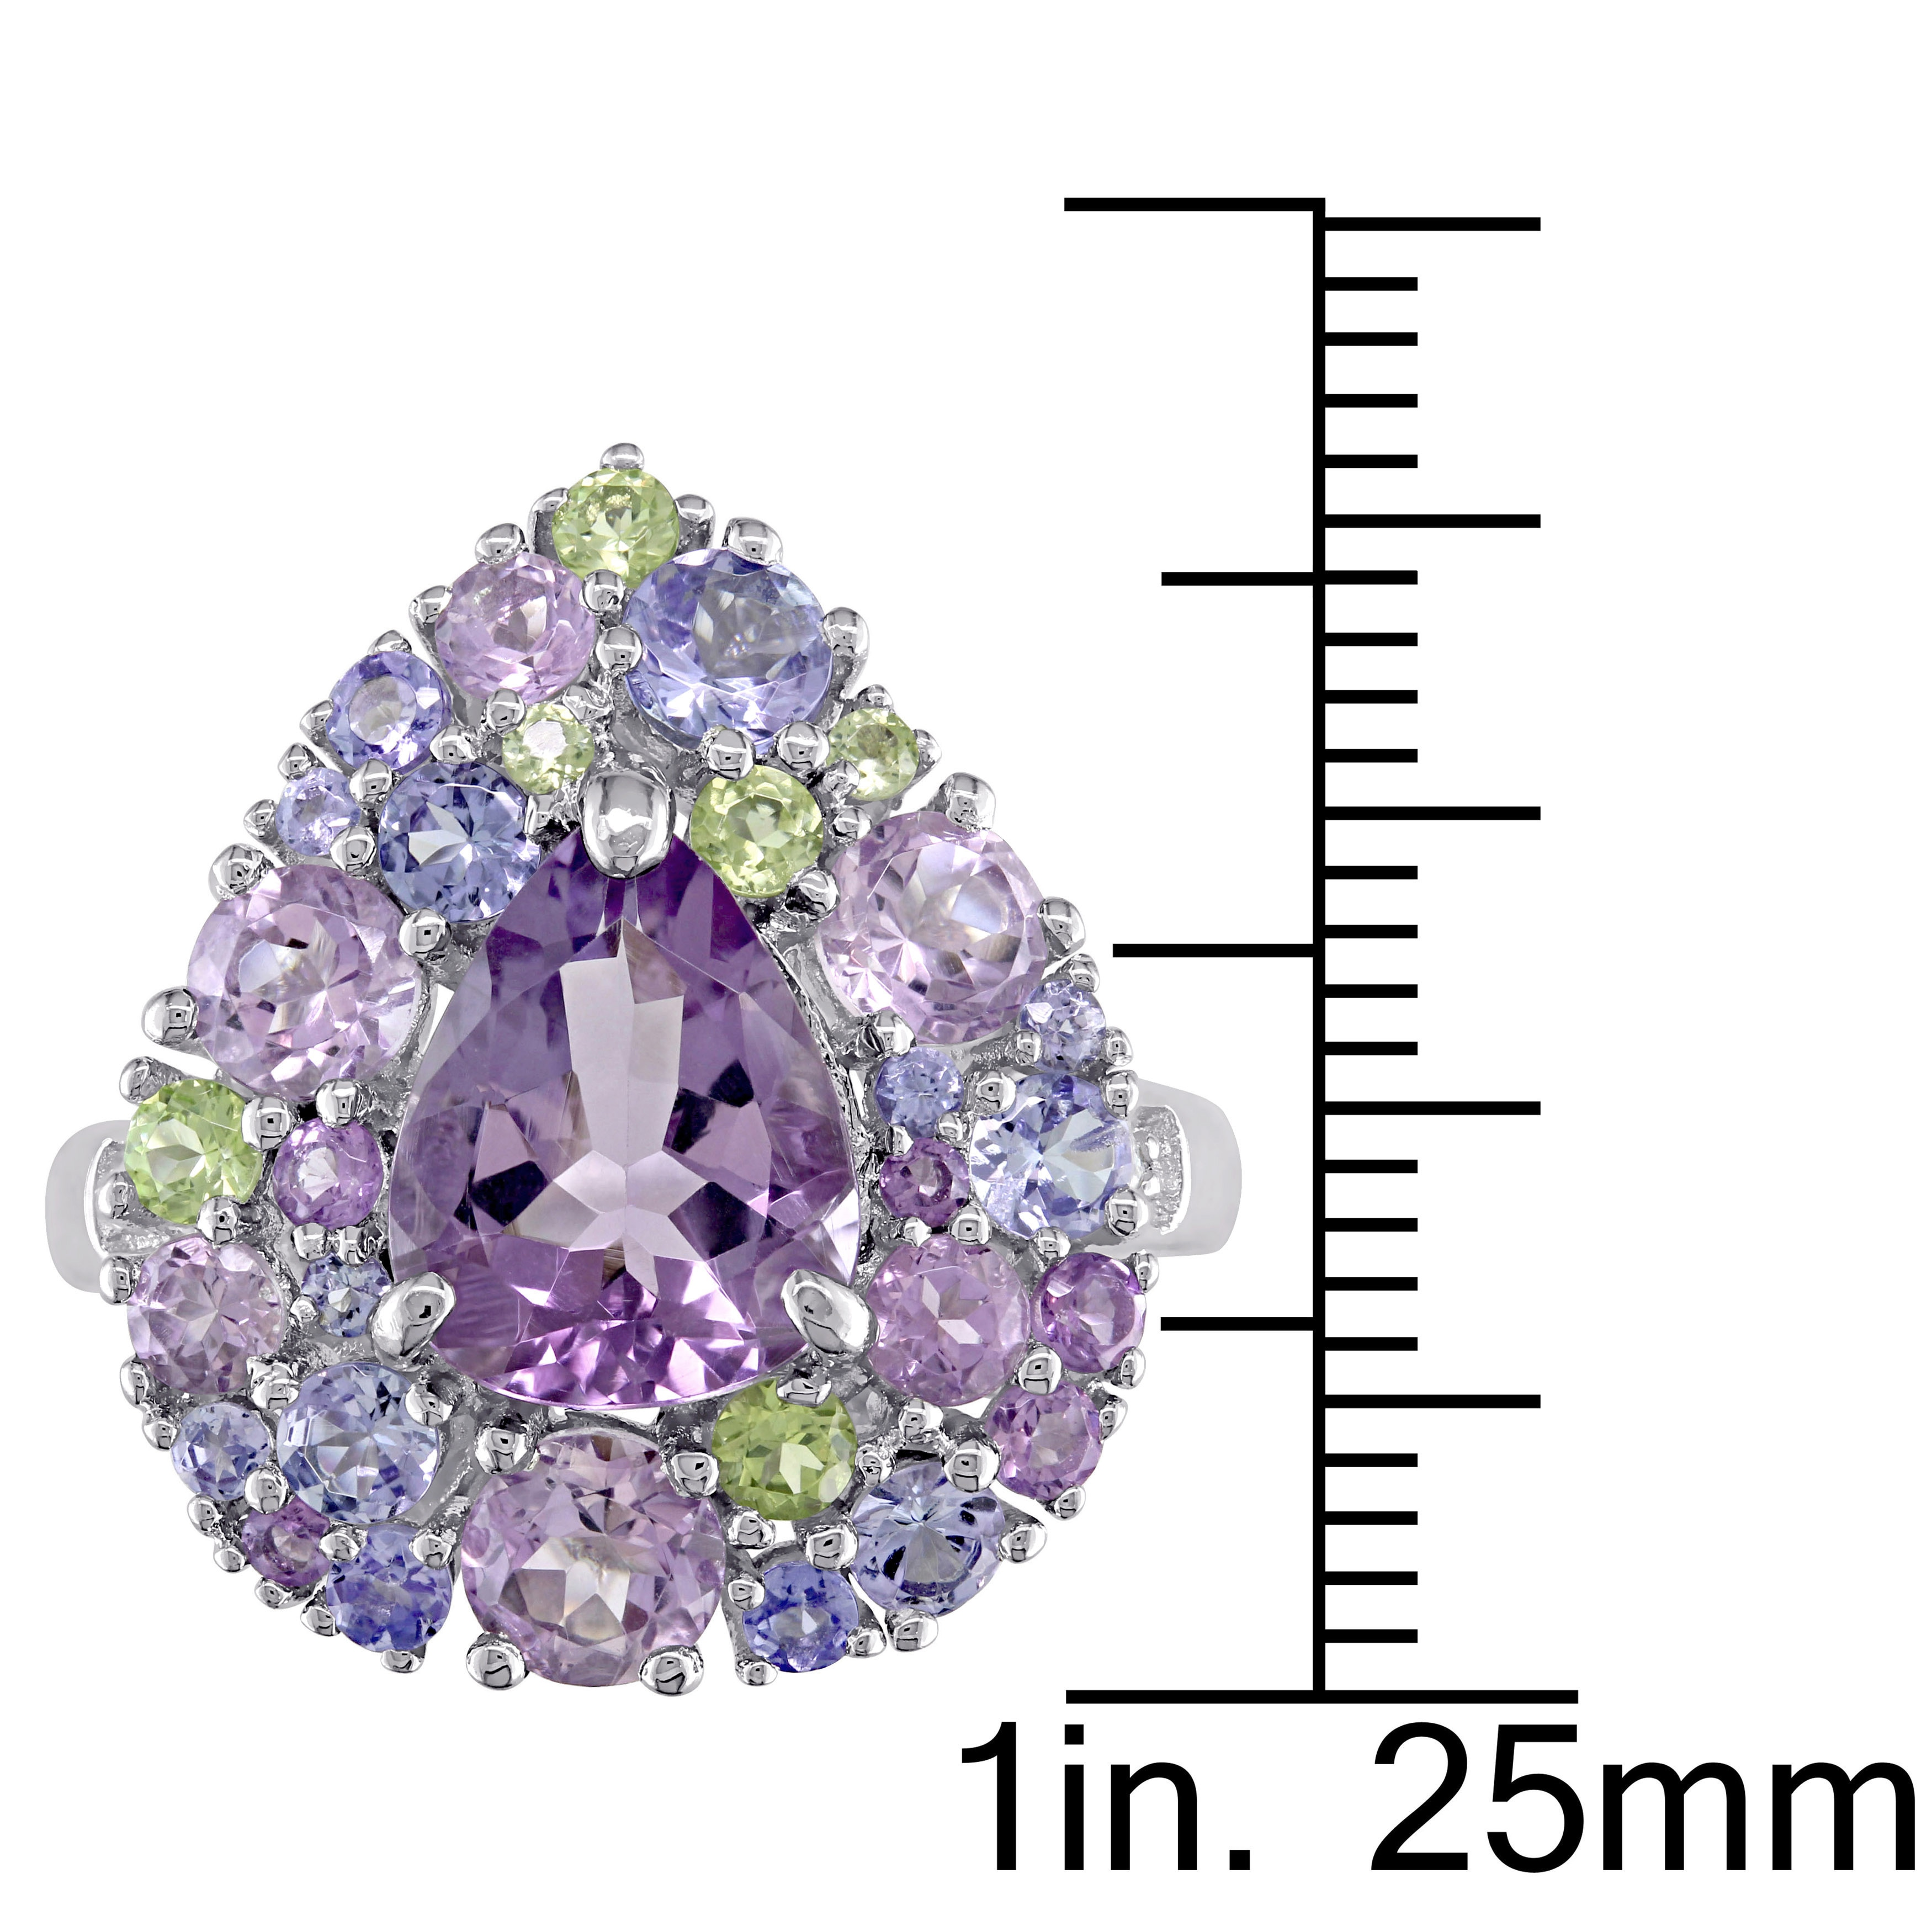 Lovely Handmade Jewellery Purple Amethyst Quartz Silver Plated 8 Grams Earring 1.75